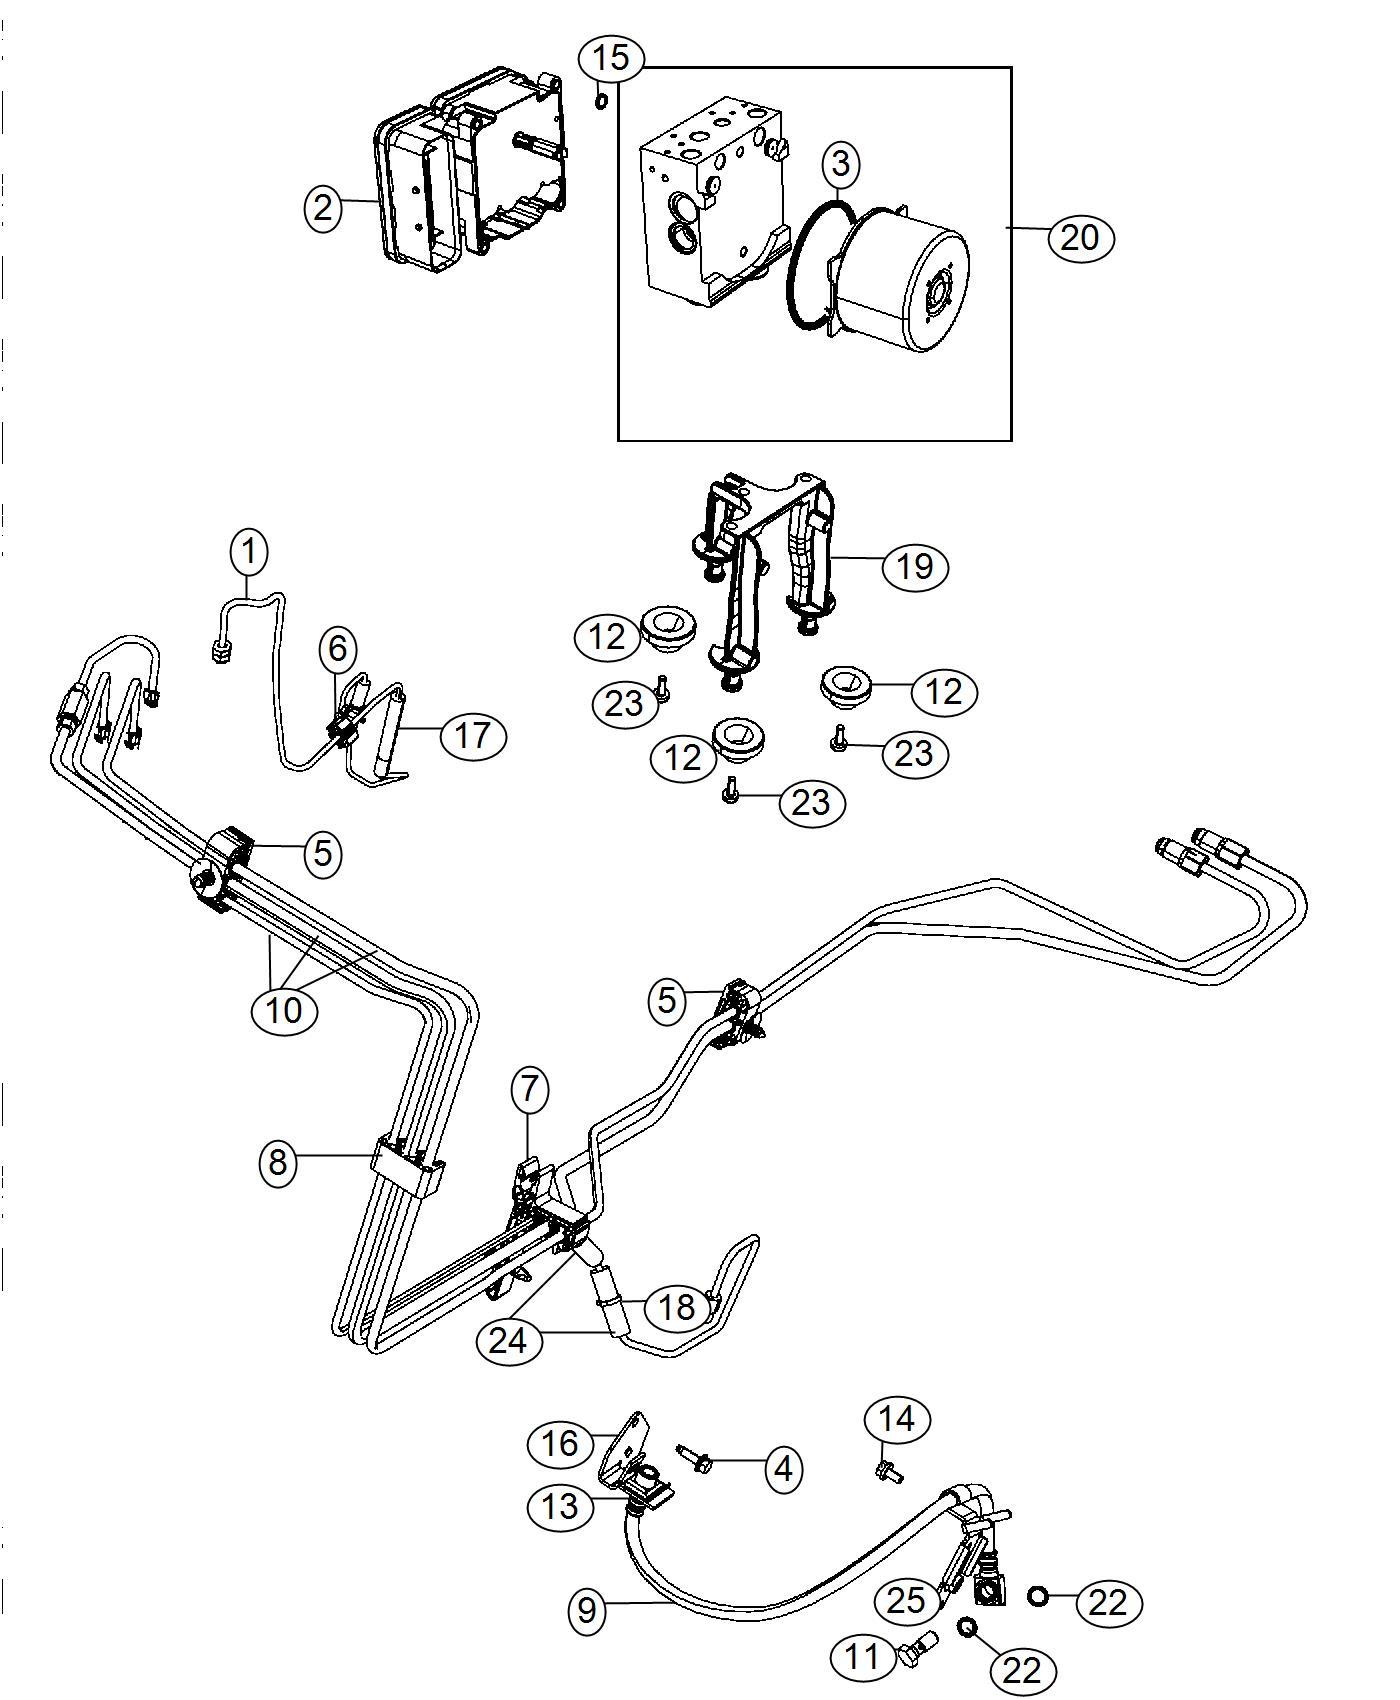 2017 Dodge Challenger Module. Anti-lock brake system